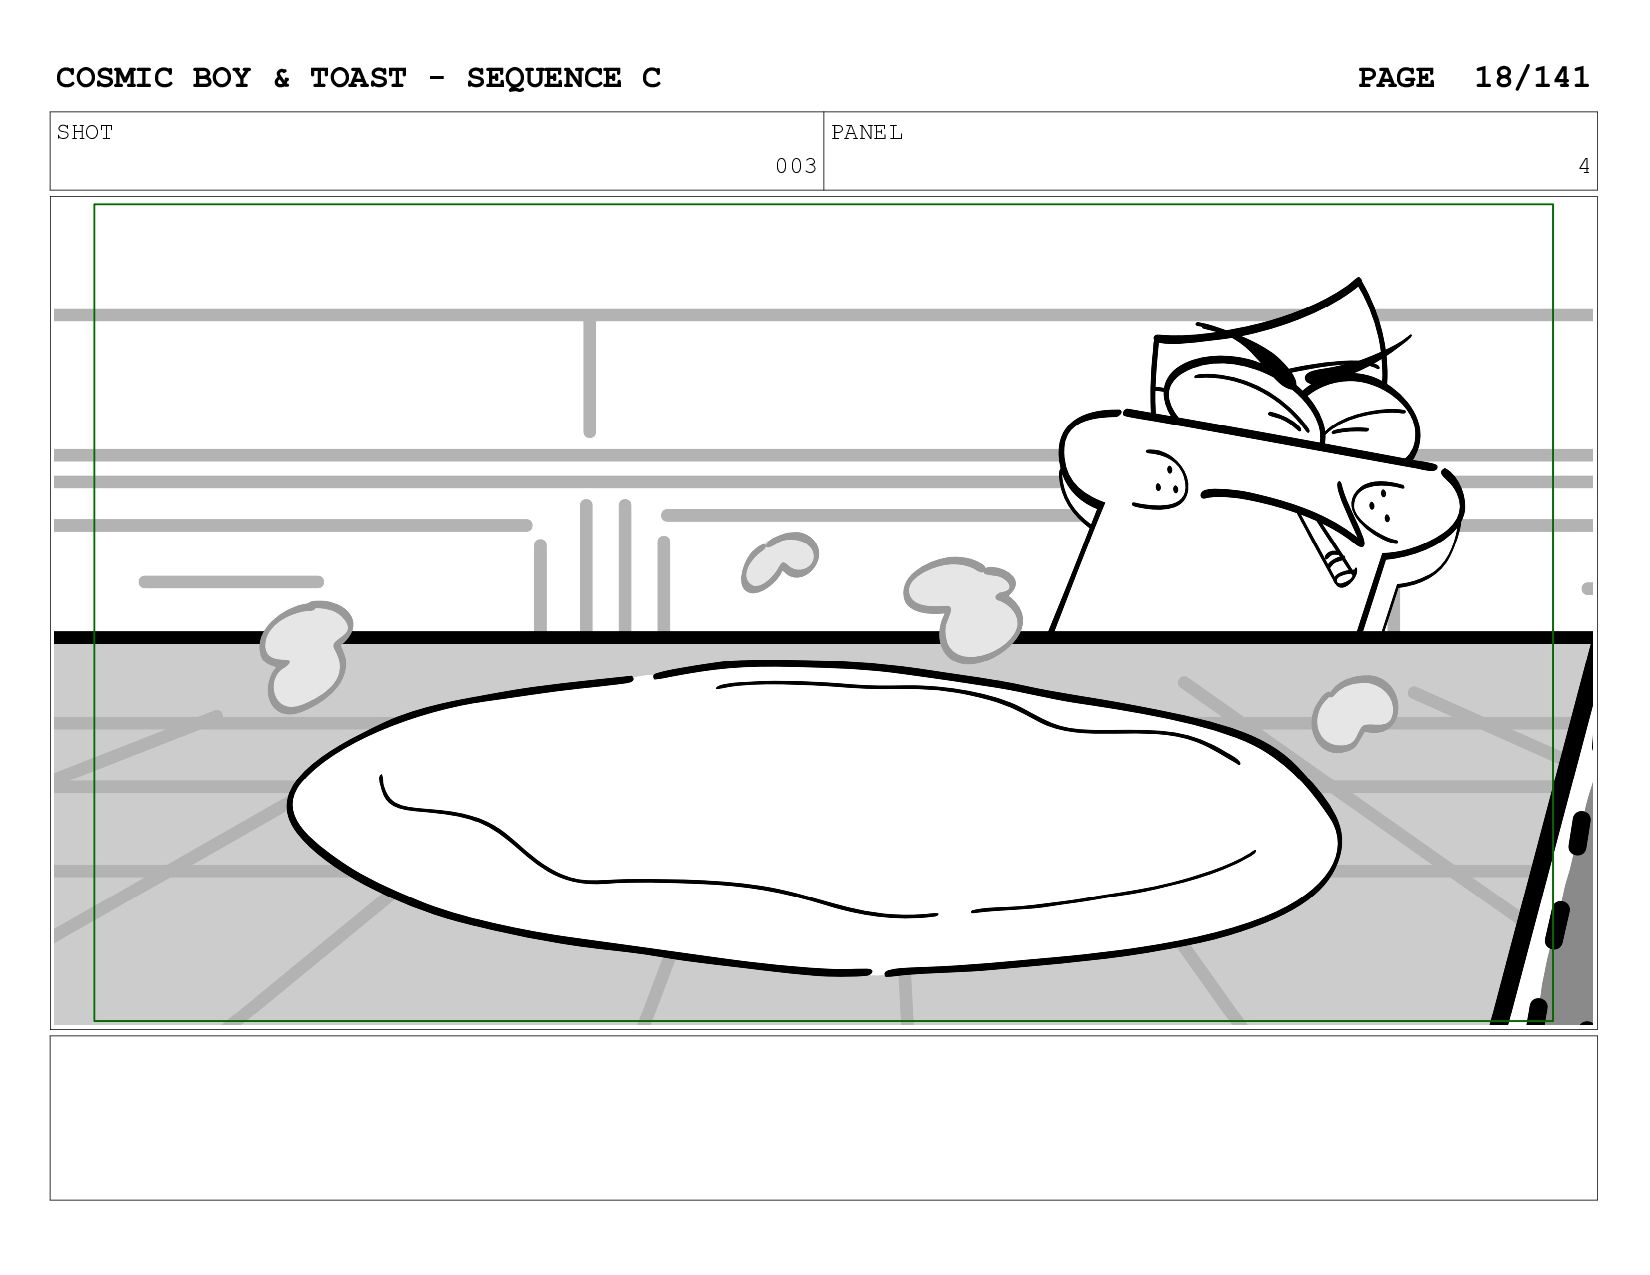 SCENE 003 PANEL D COSMIC BOY & TOAST - SEQUENCE...